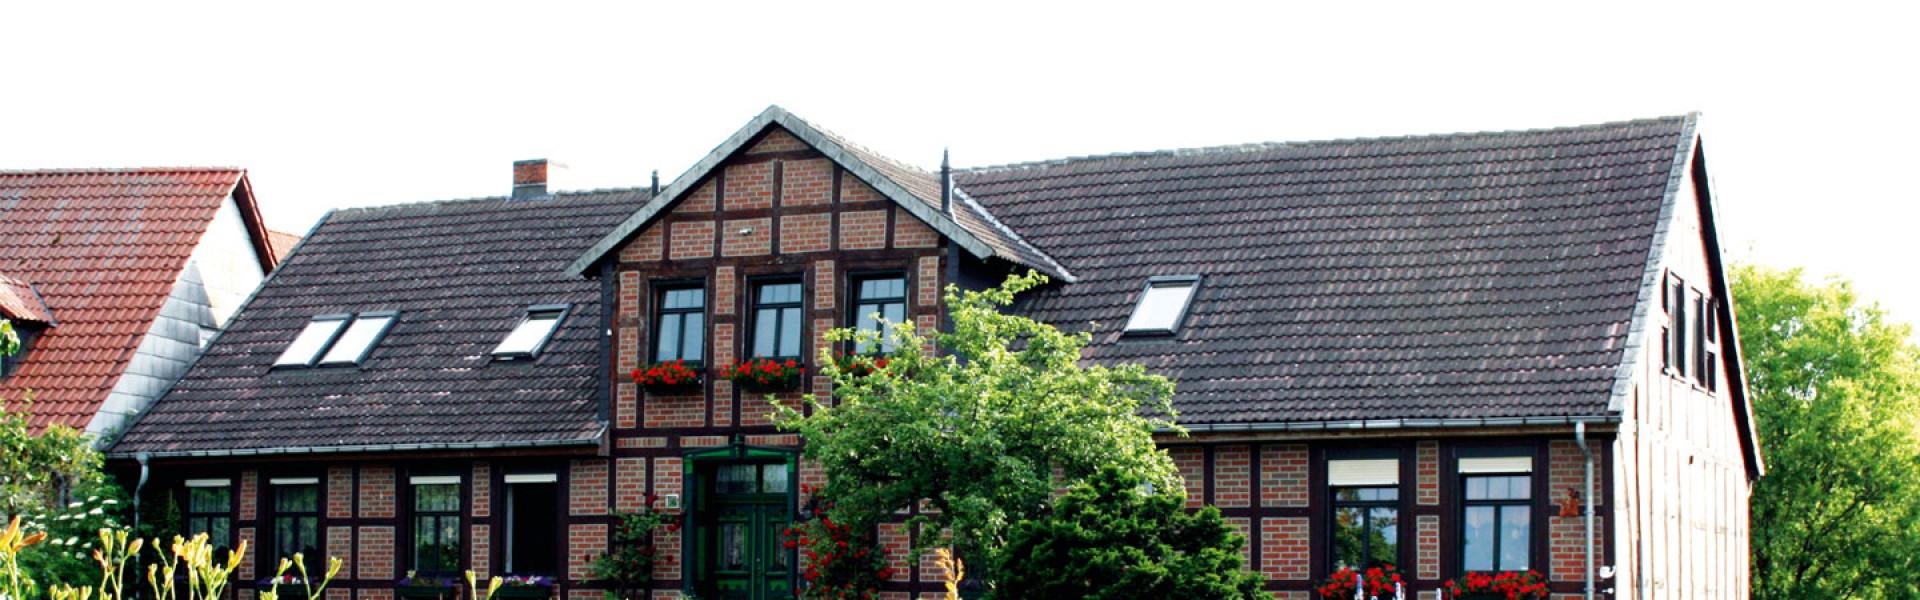 Bauernhof-Eversdorf